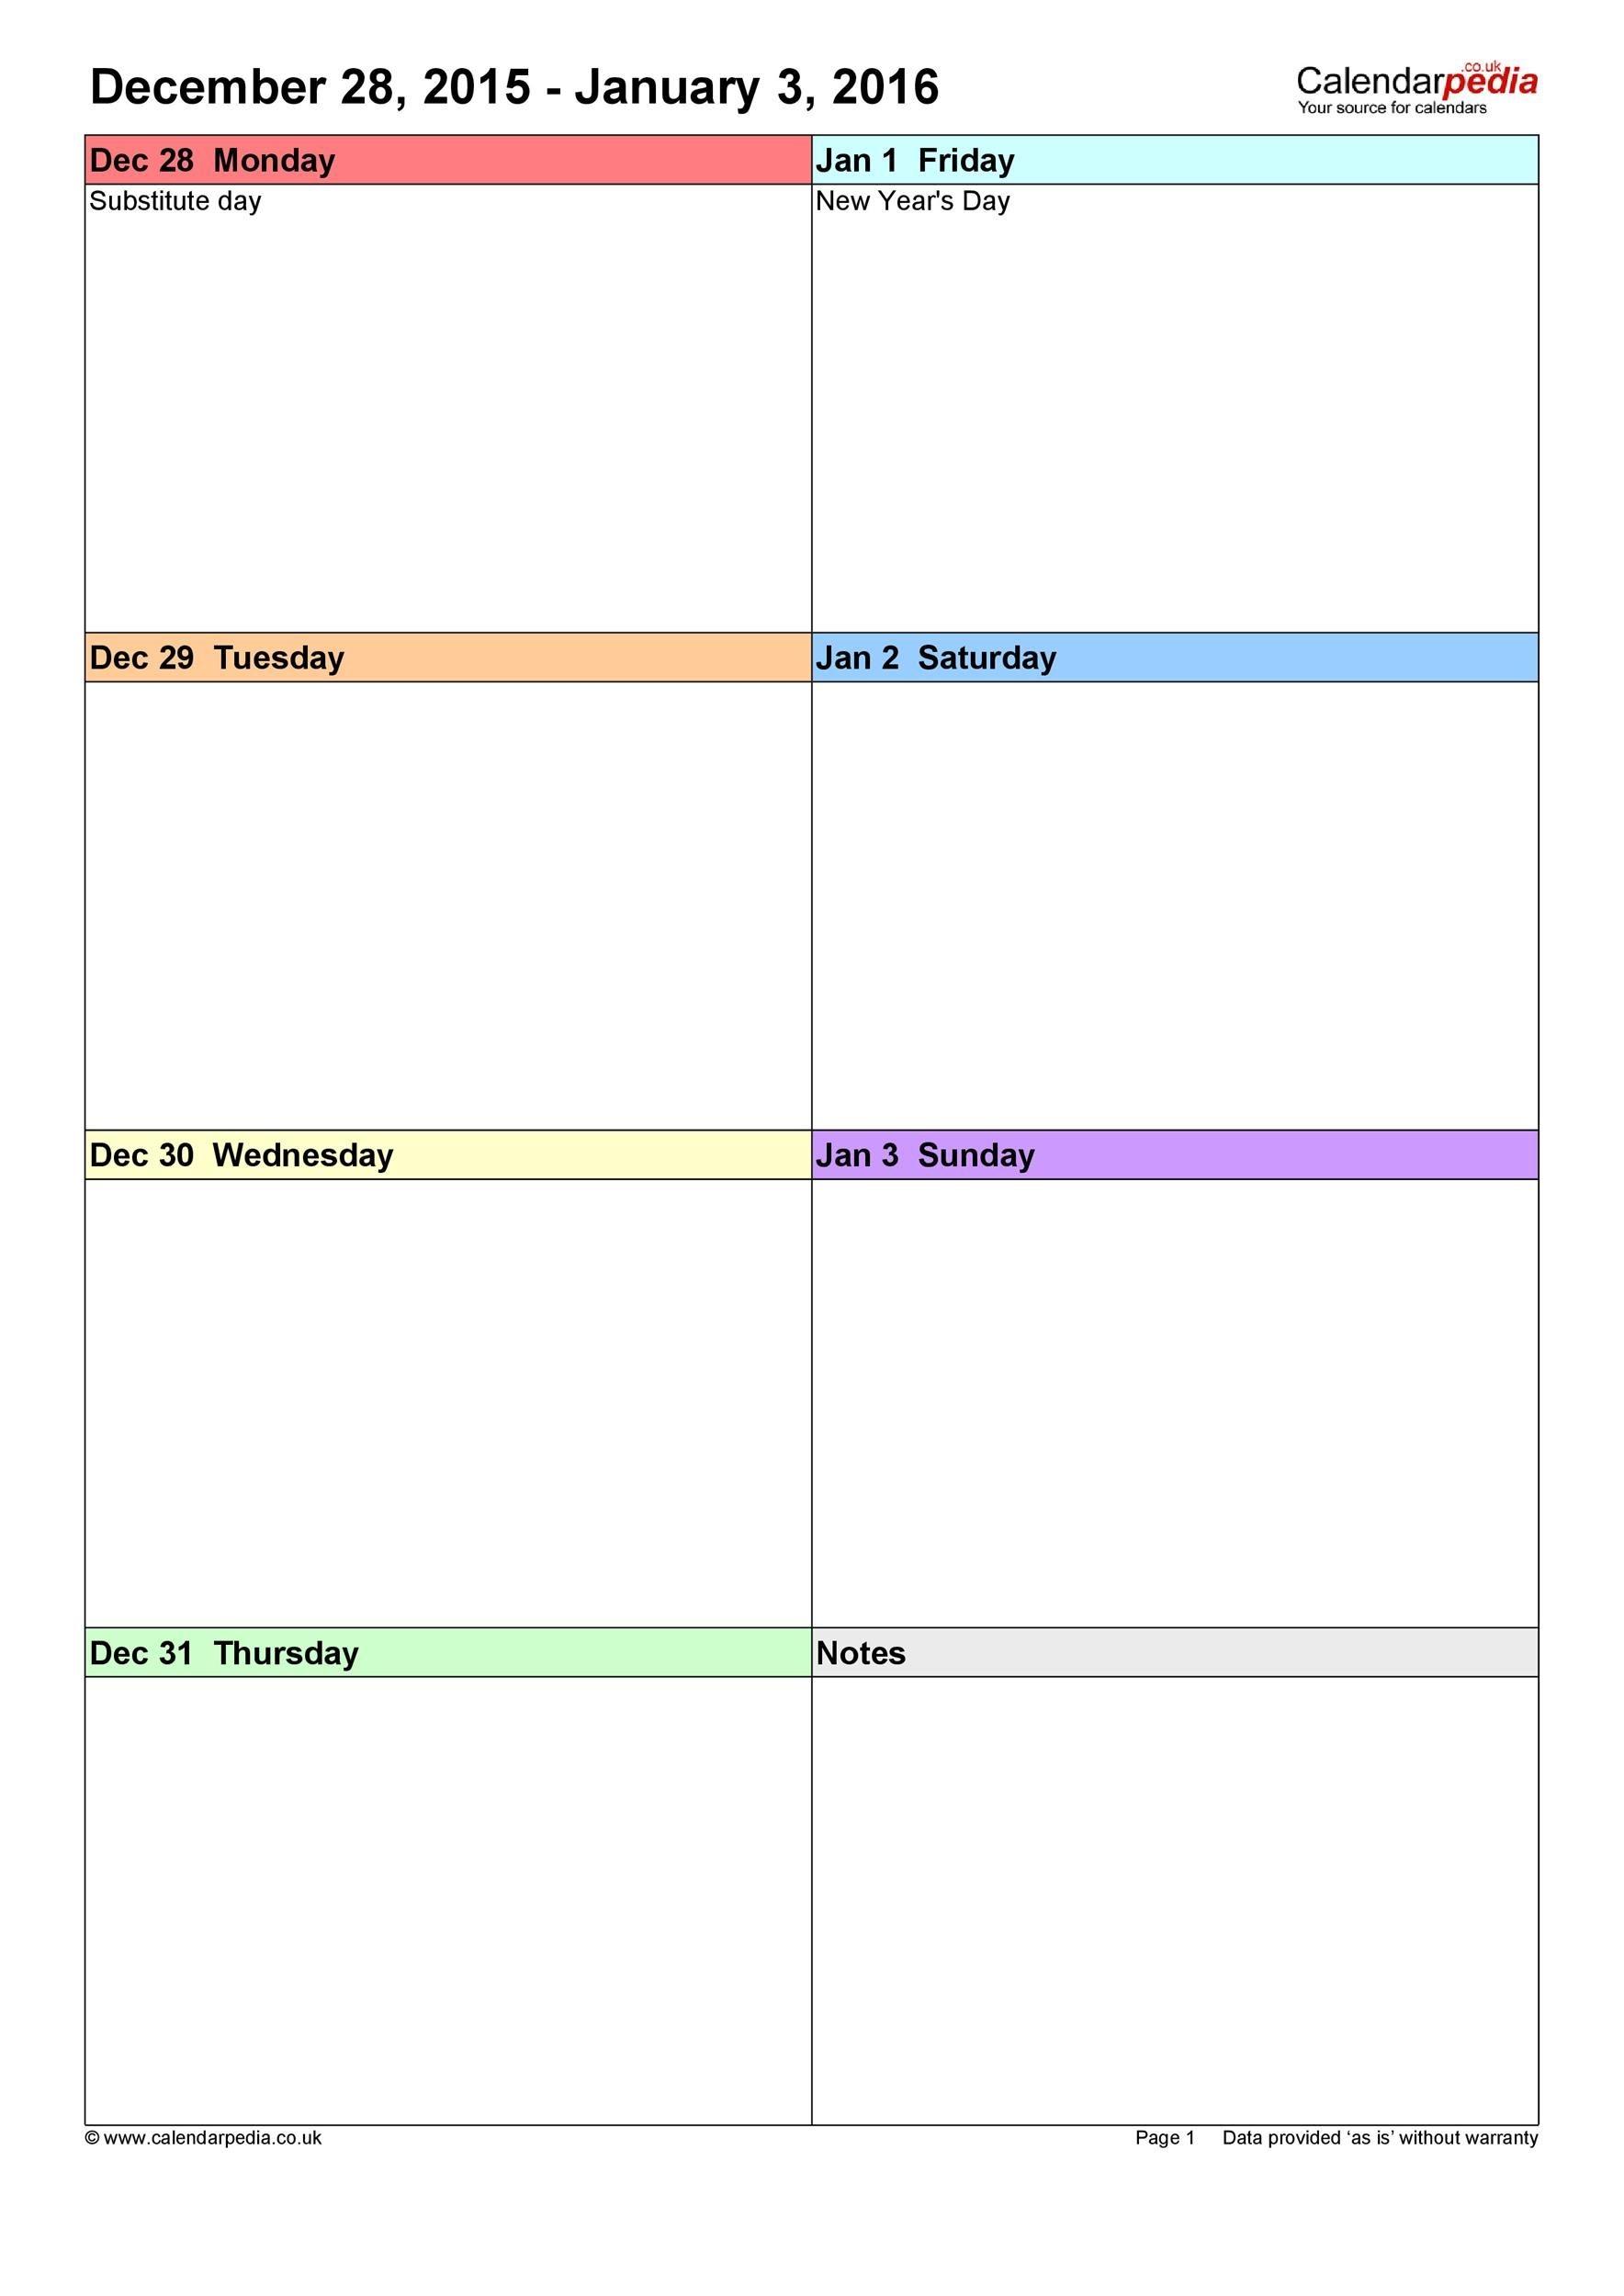 26 Blank Weekly Calendar Templates [Pdf, Excel, Word] ᐅ